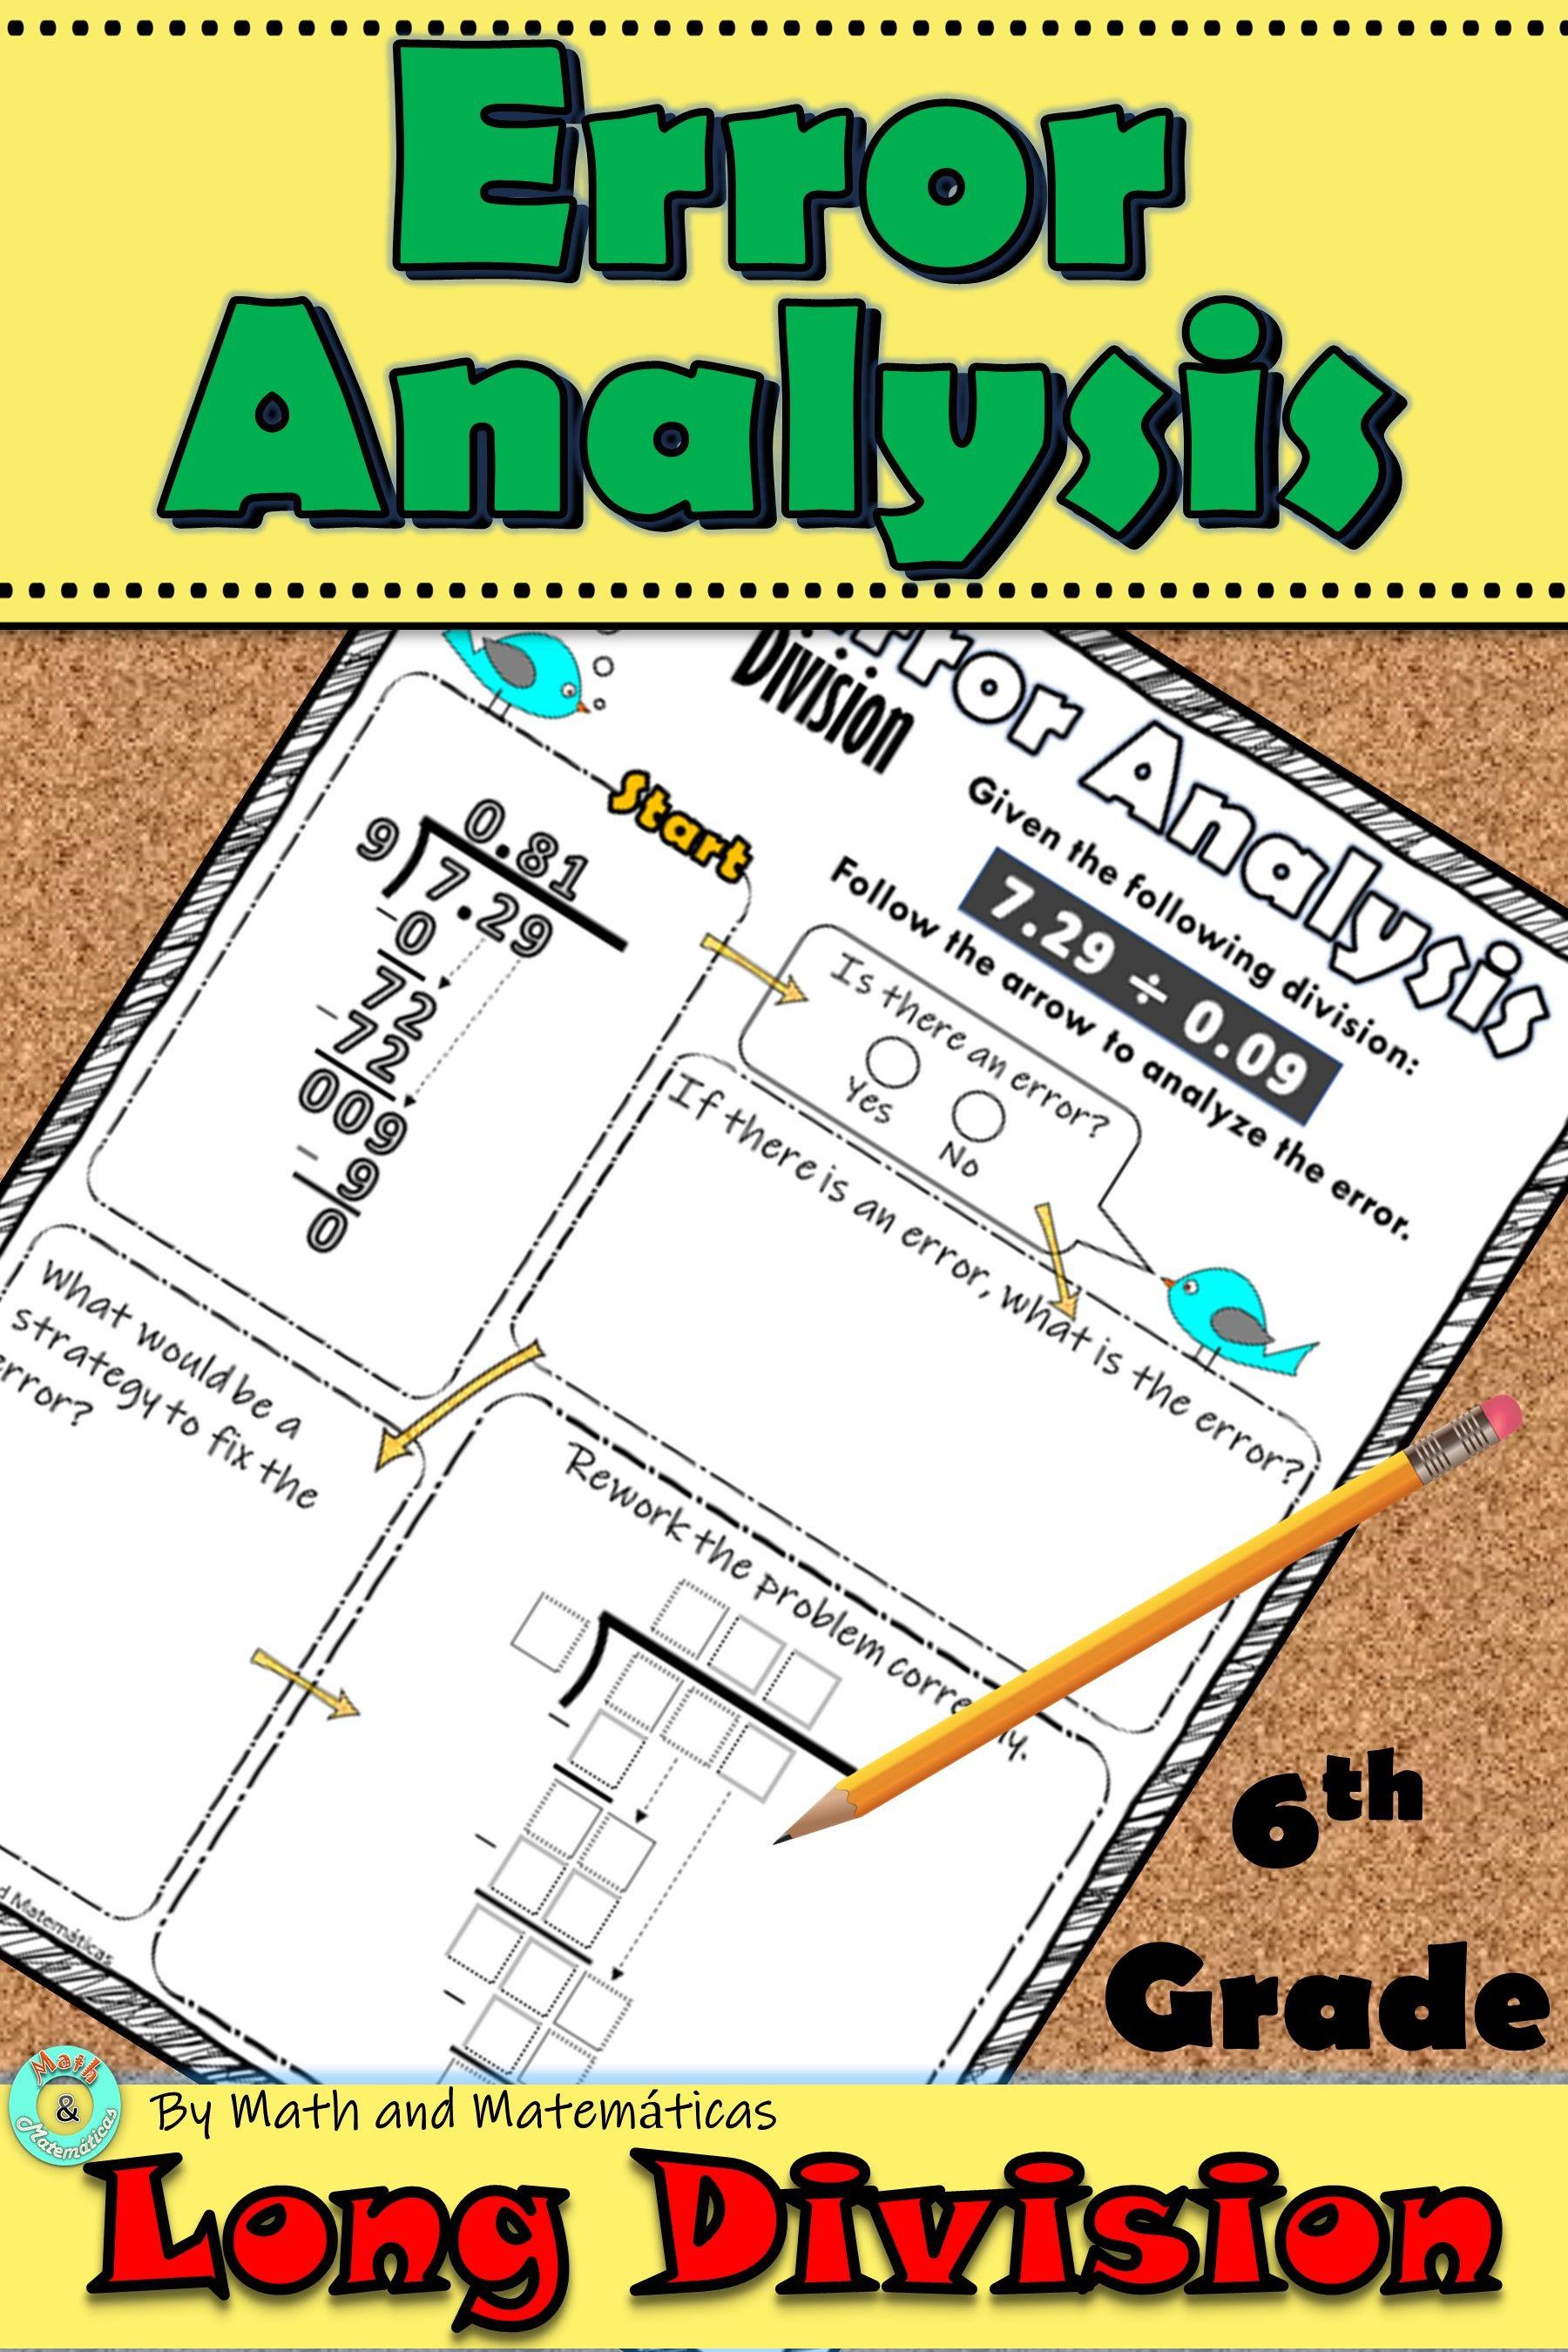 Long Division Errorysis For 6th Grade